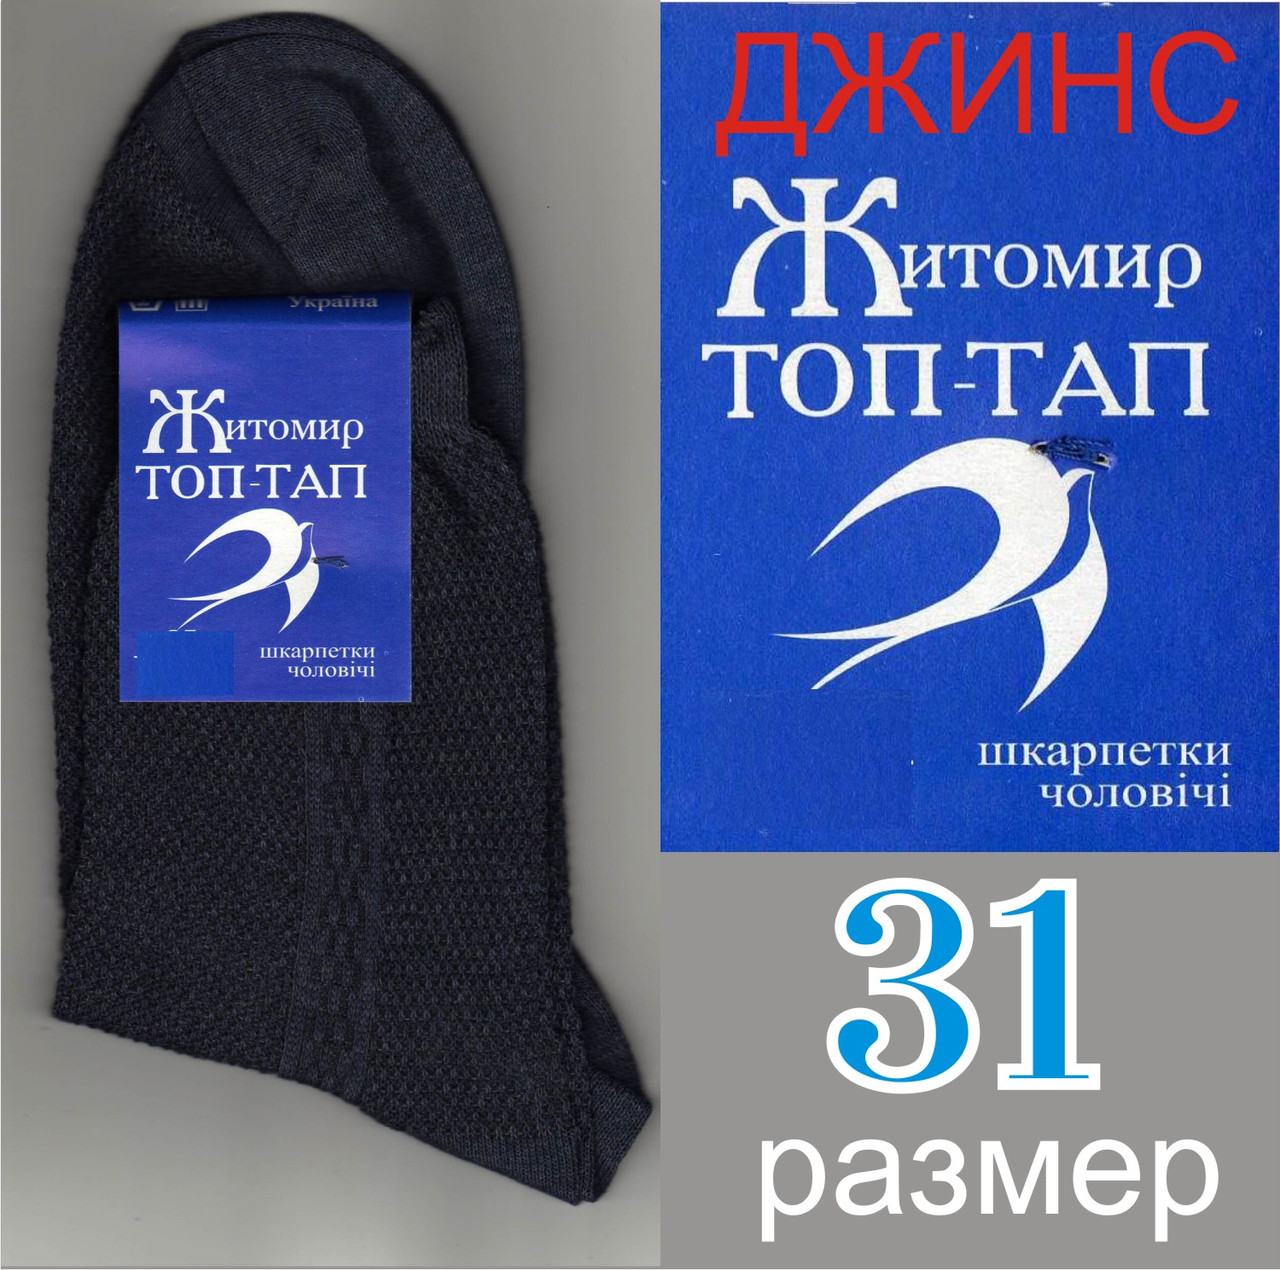 Носки мужские СЕТКА х/б Топ-Тап, г. Житомир 31 размер джинс НМЛ-0620